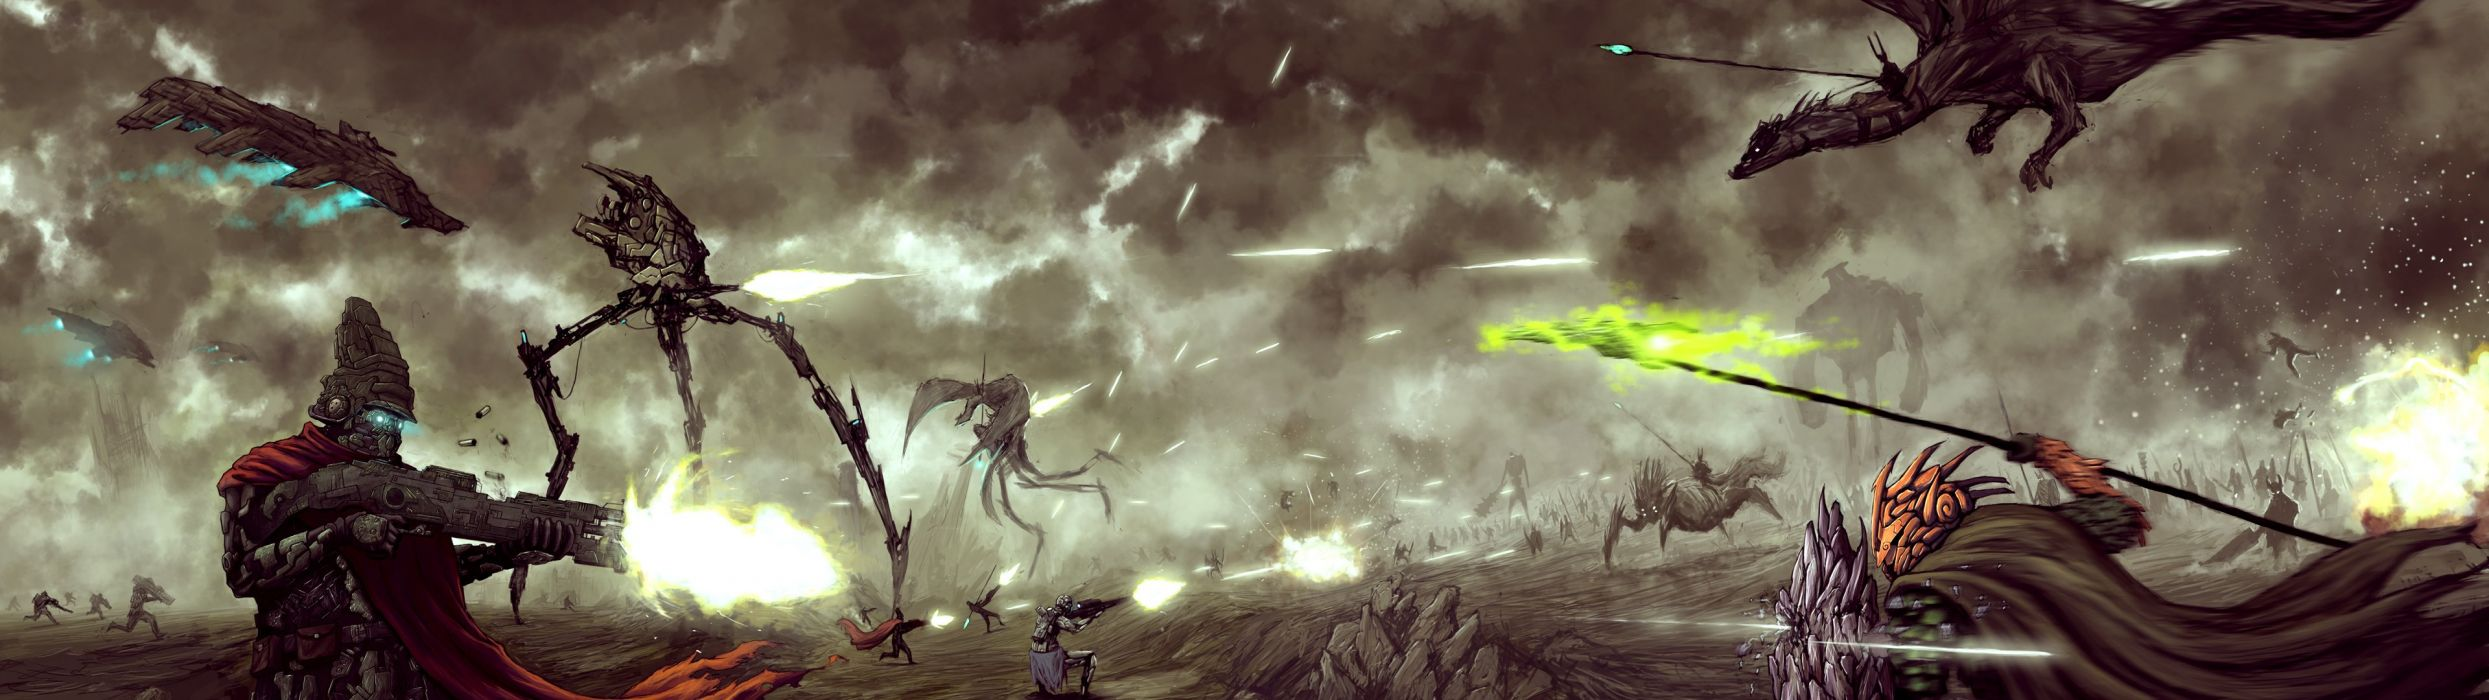 war science fiction artwork wallpaper